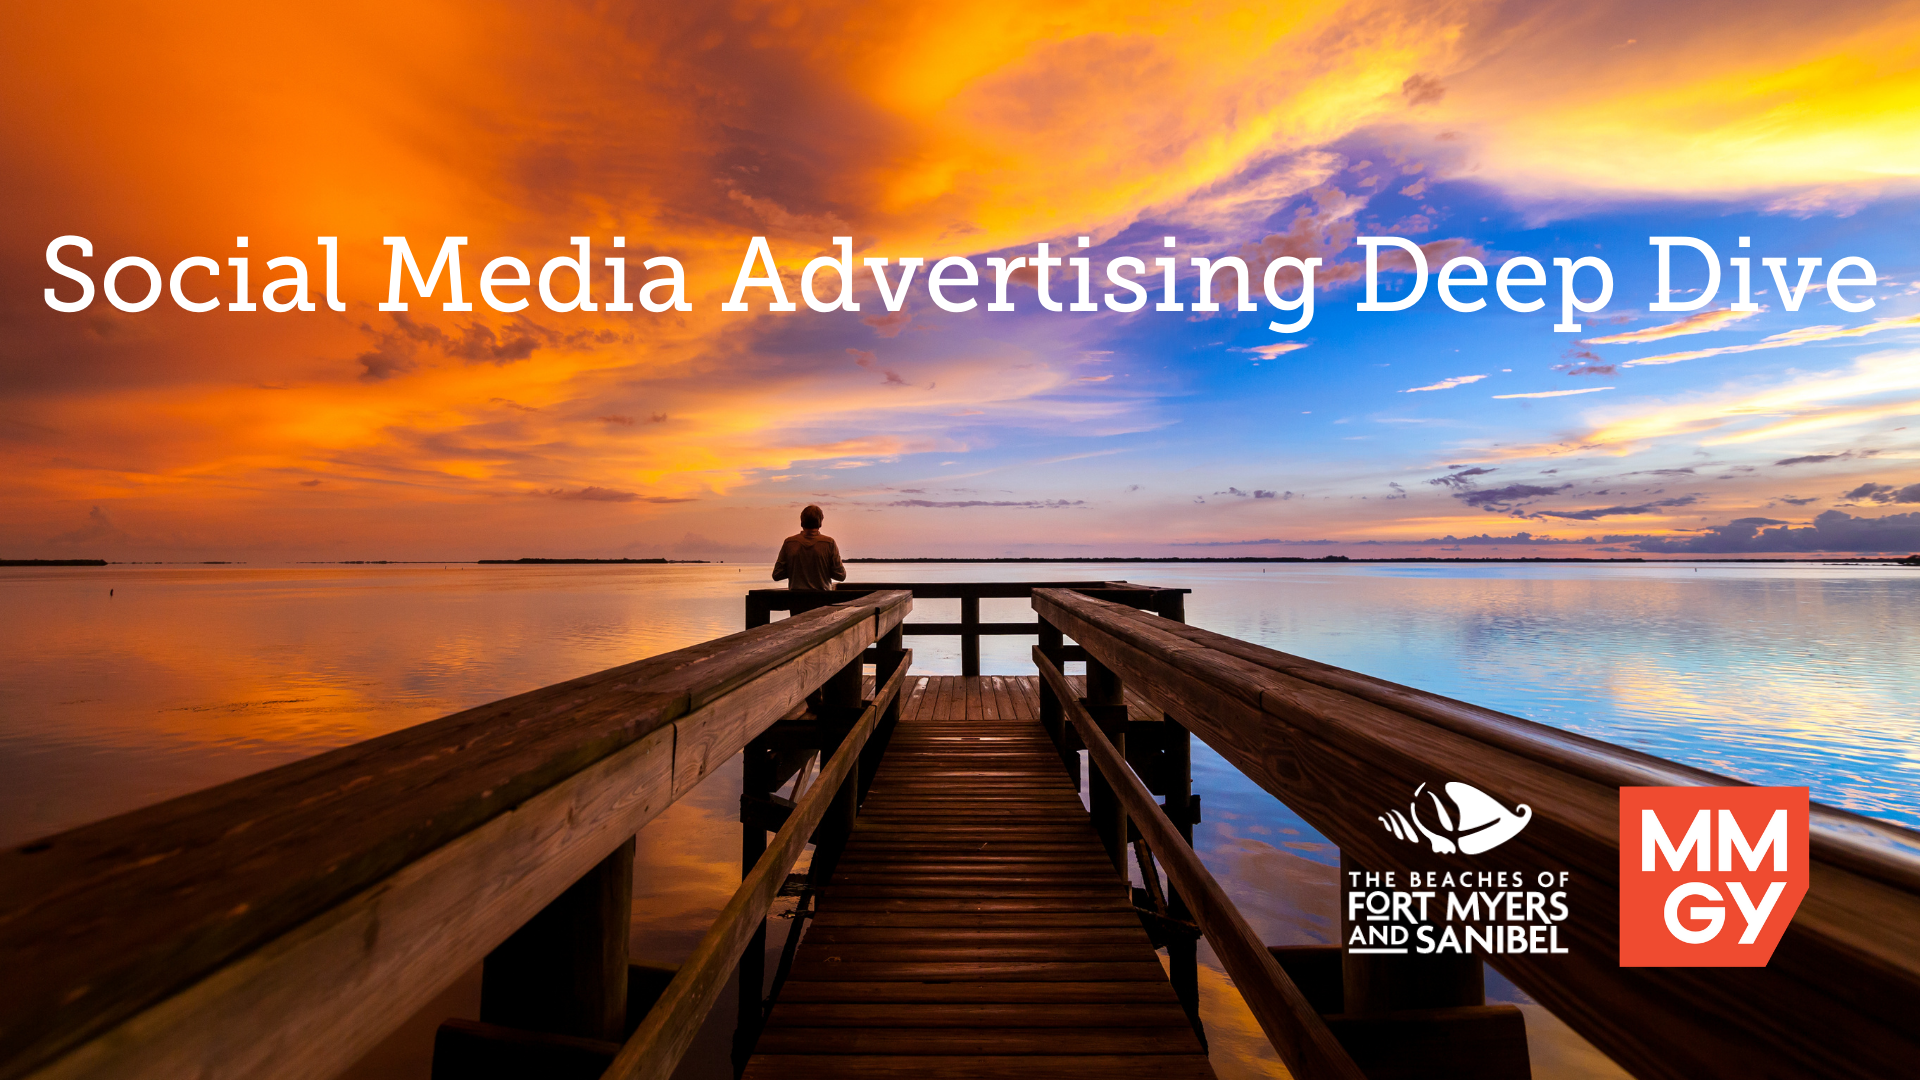 Social media advertising deep dive